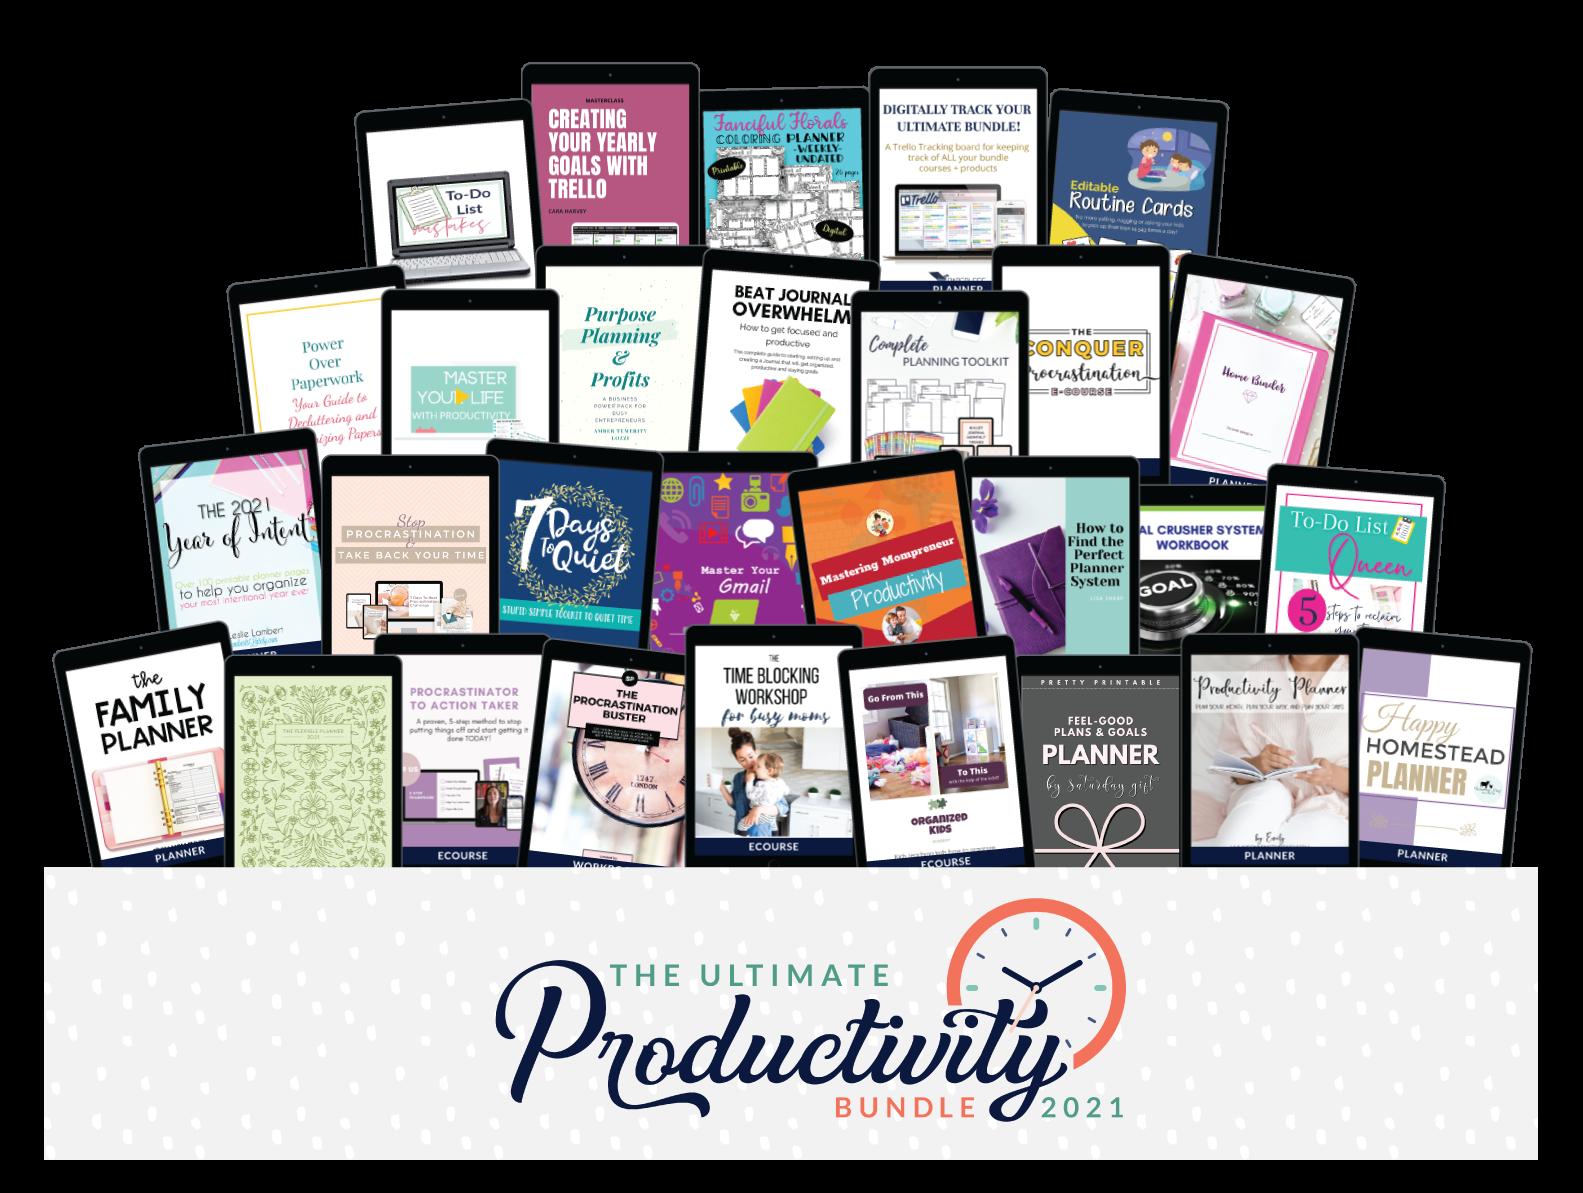 Ultimate Productivity Bundle 2021